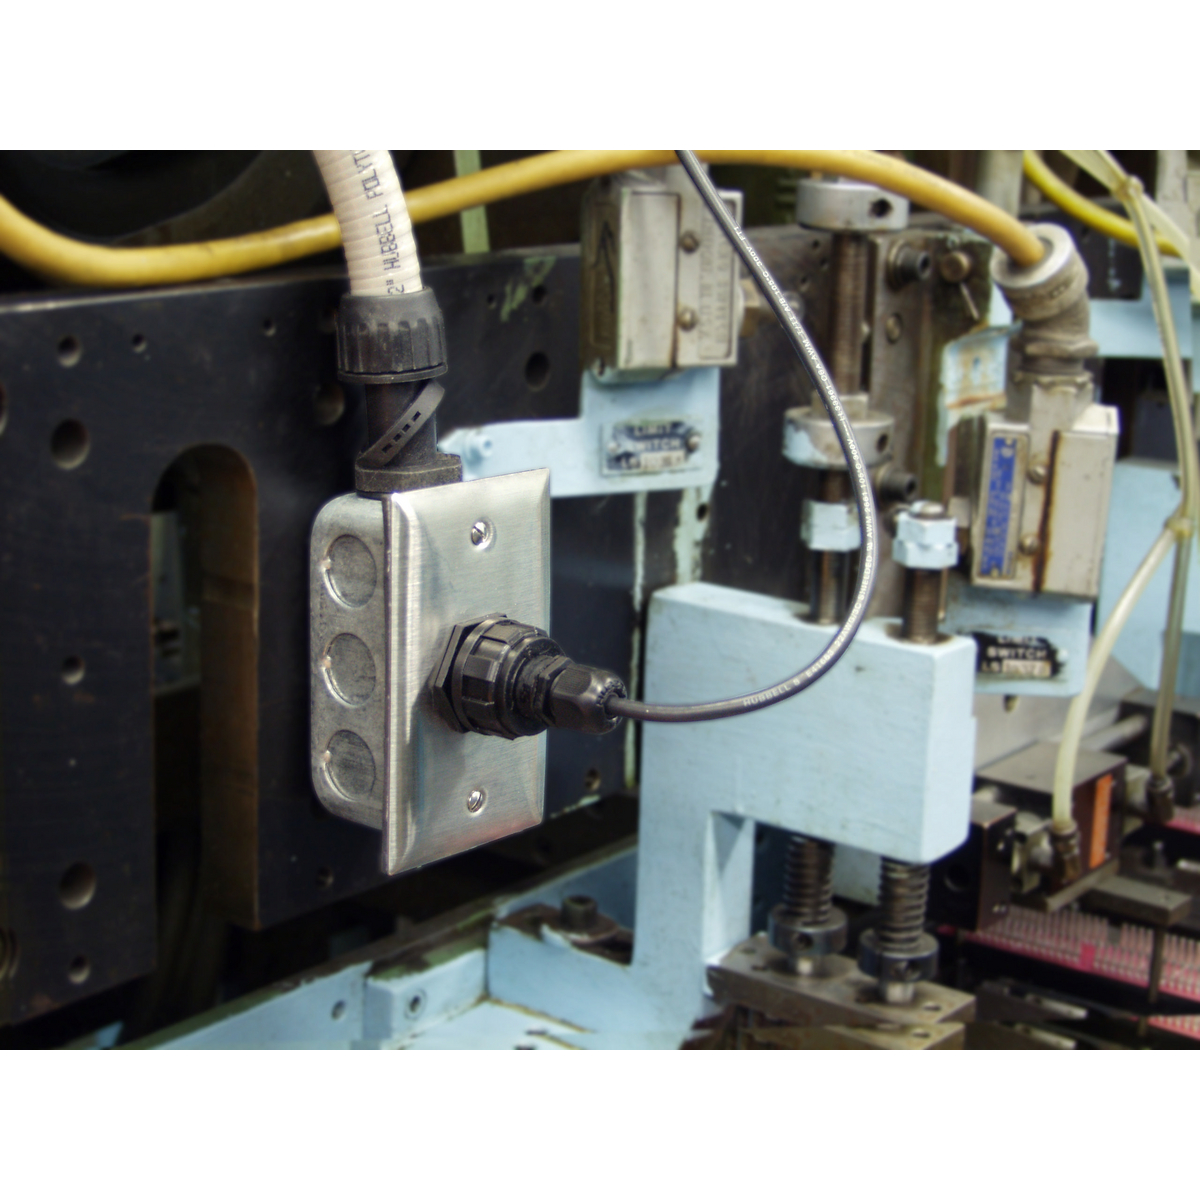 HI6 | Brand | Wiring Device - Kellems